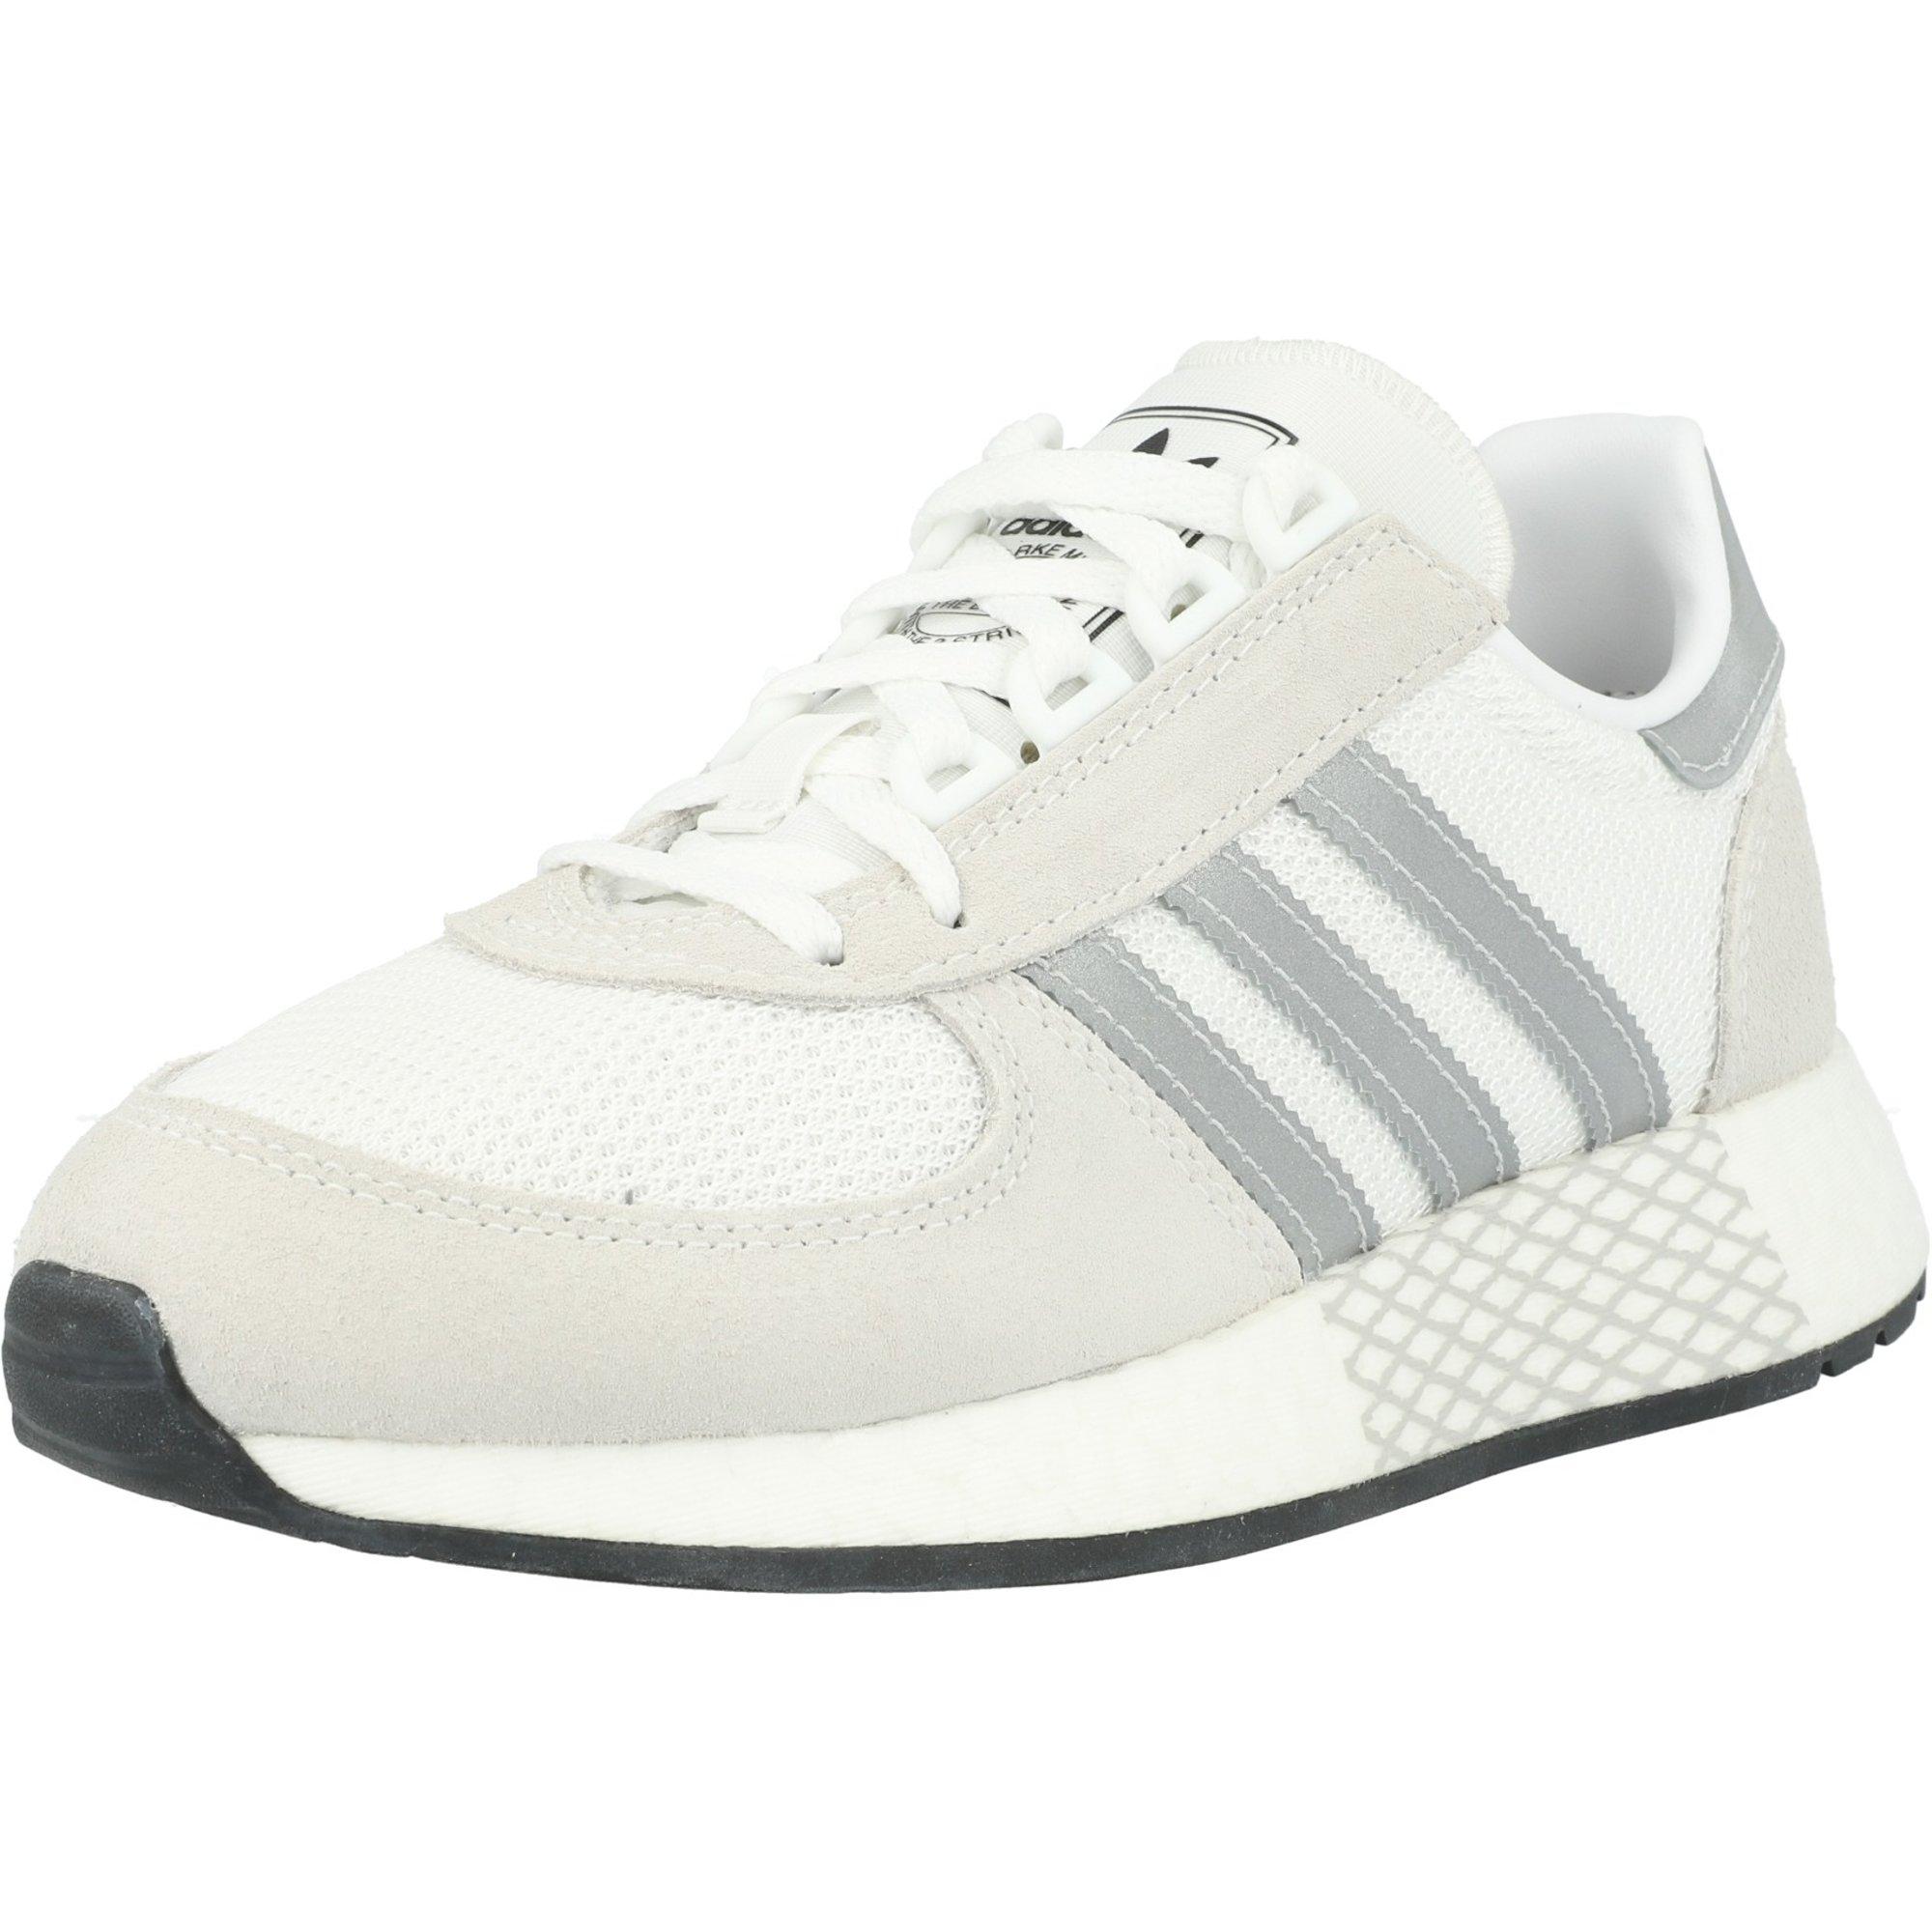 adidas Originals Marathon Tech White